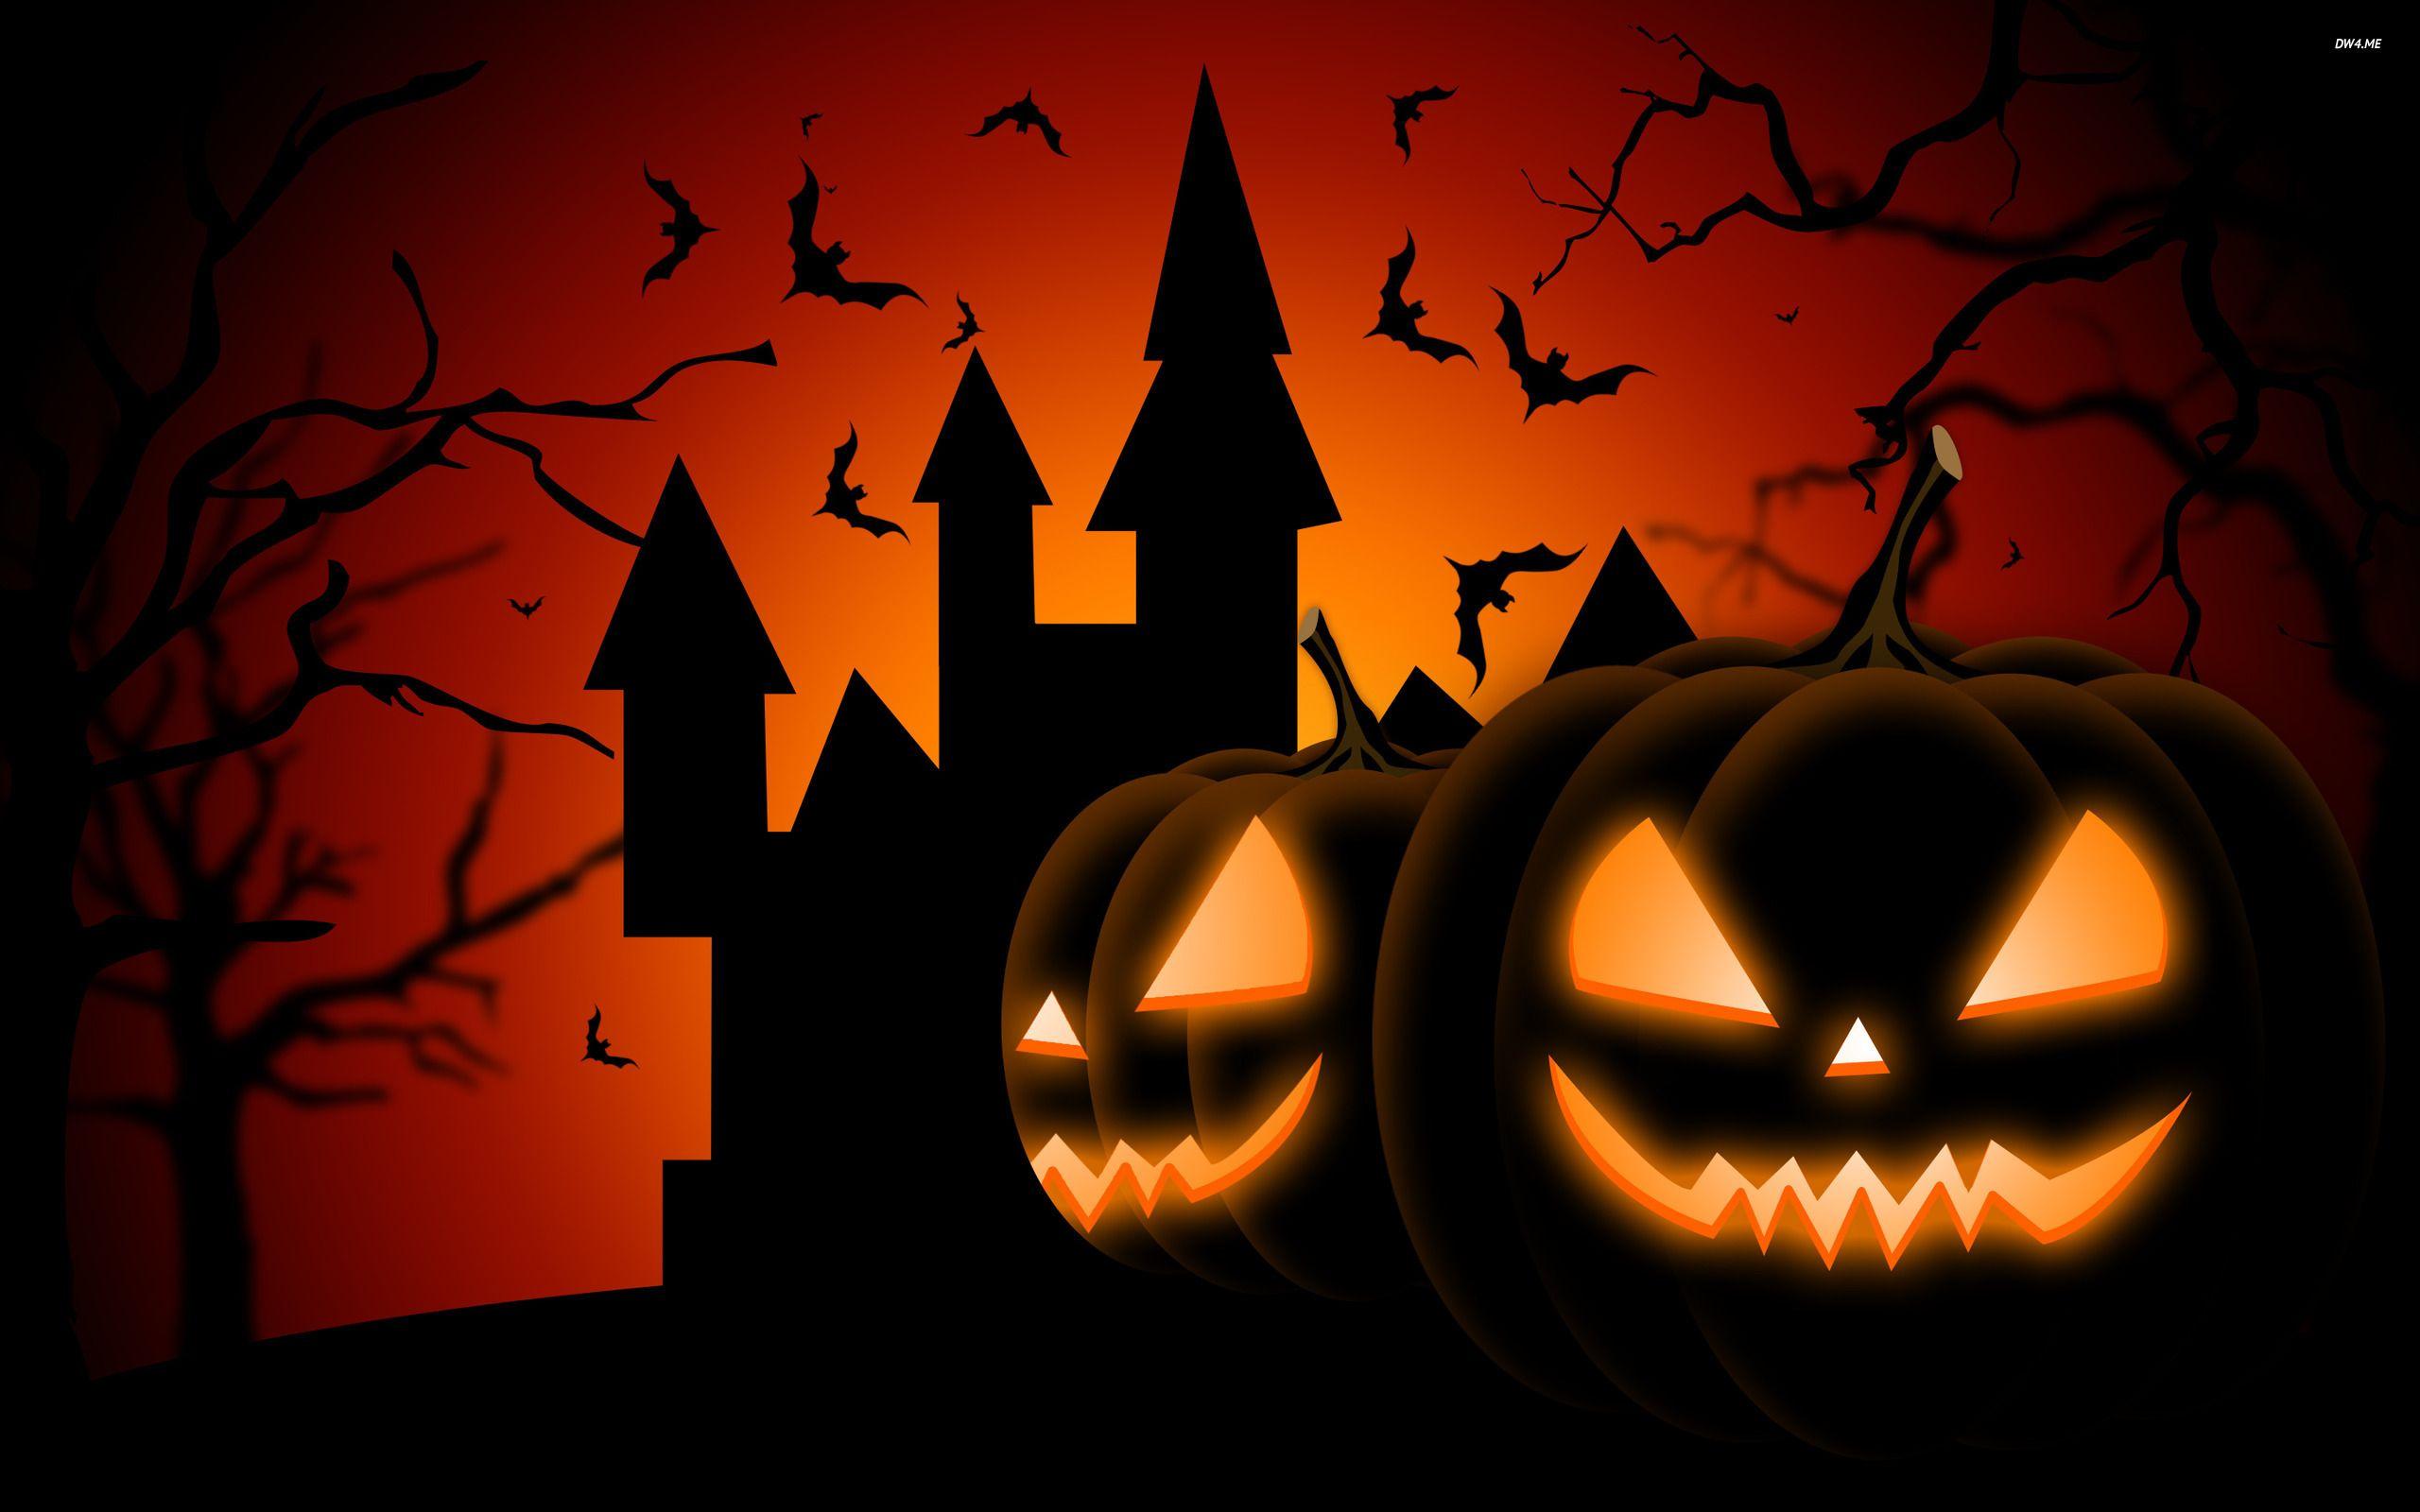 Download Wallpaper Halloween Pinterest - fe565b0f9b0d15cce9874bd12139bc7f  Gallery_585819.jpg